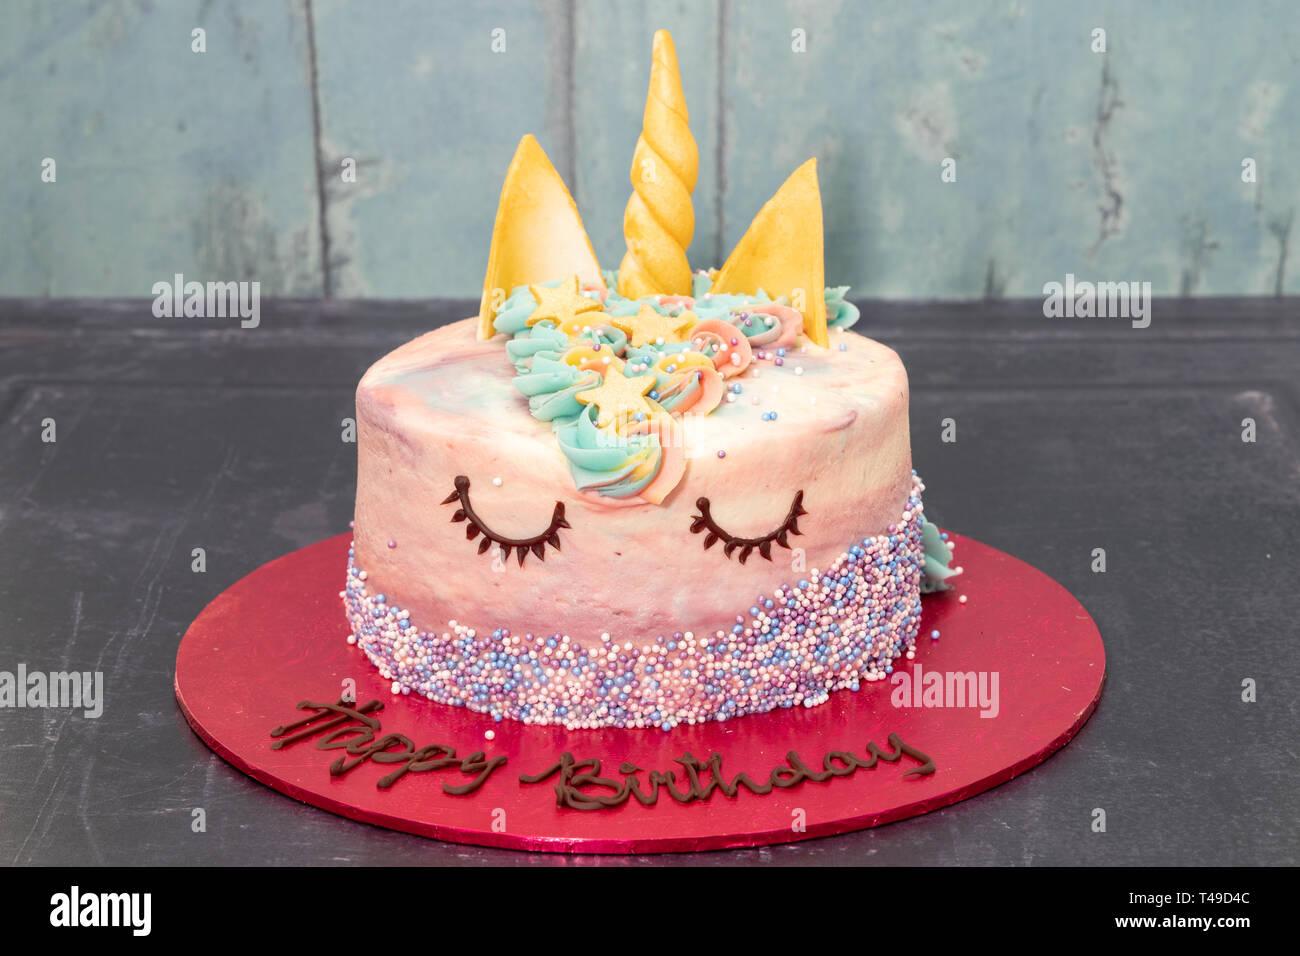 Childrens Party Unicorn Birthday Cake Stock Photo 243611660 Alamy